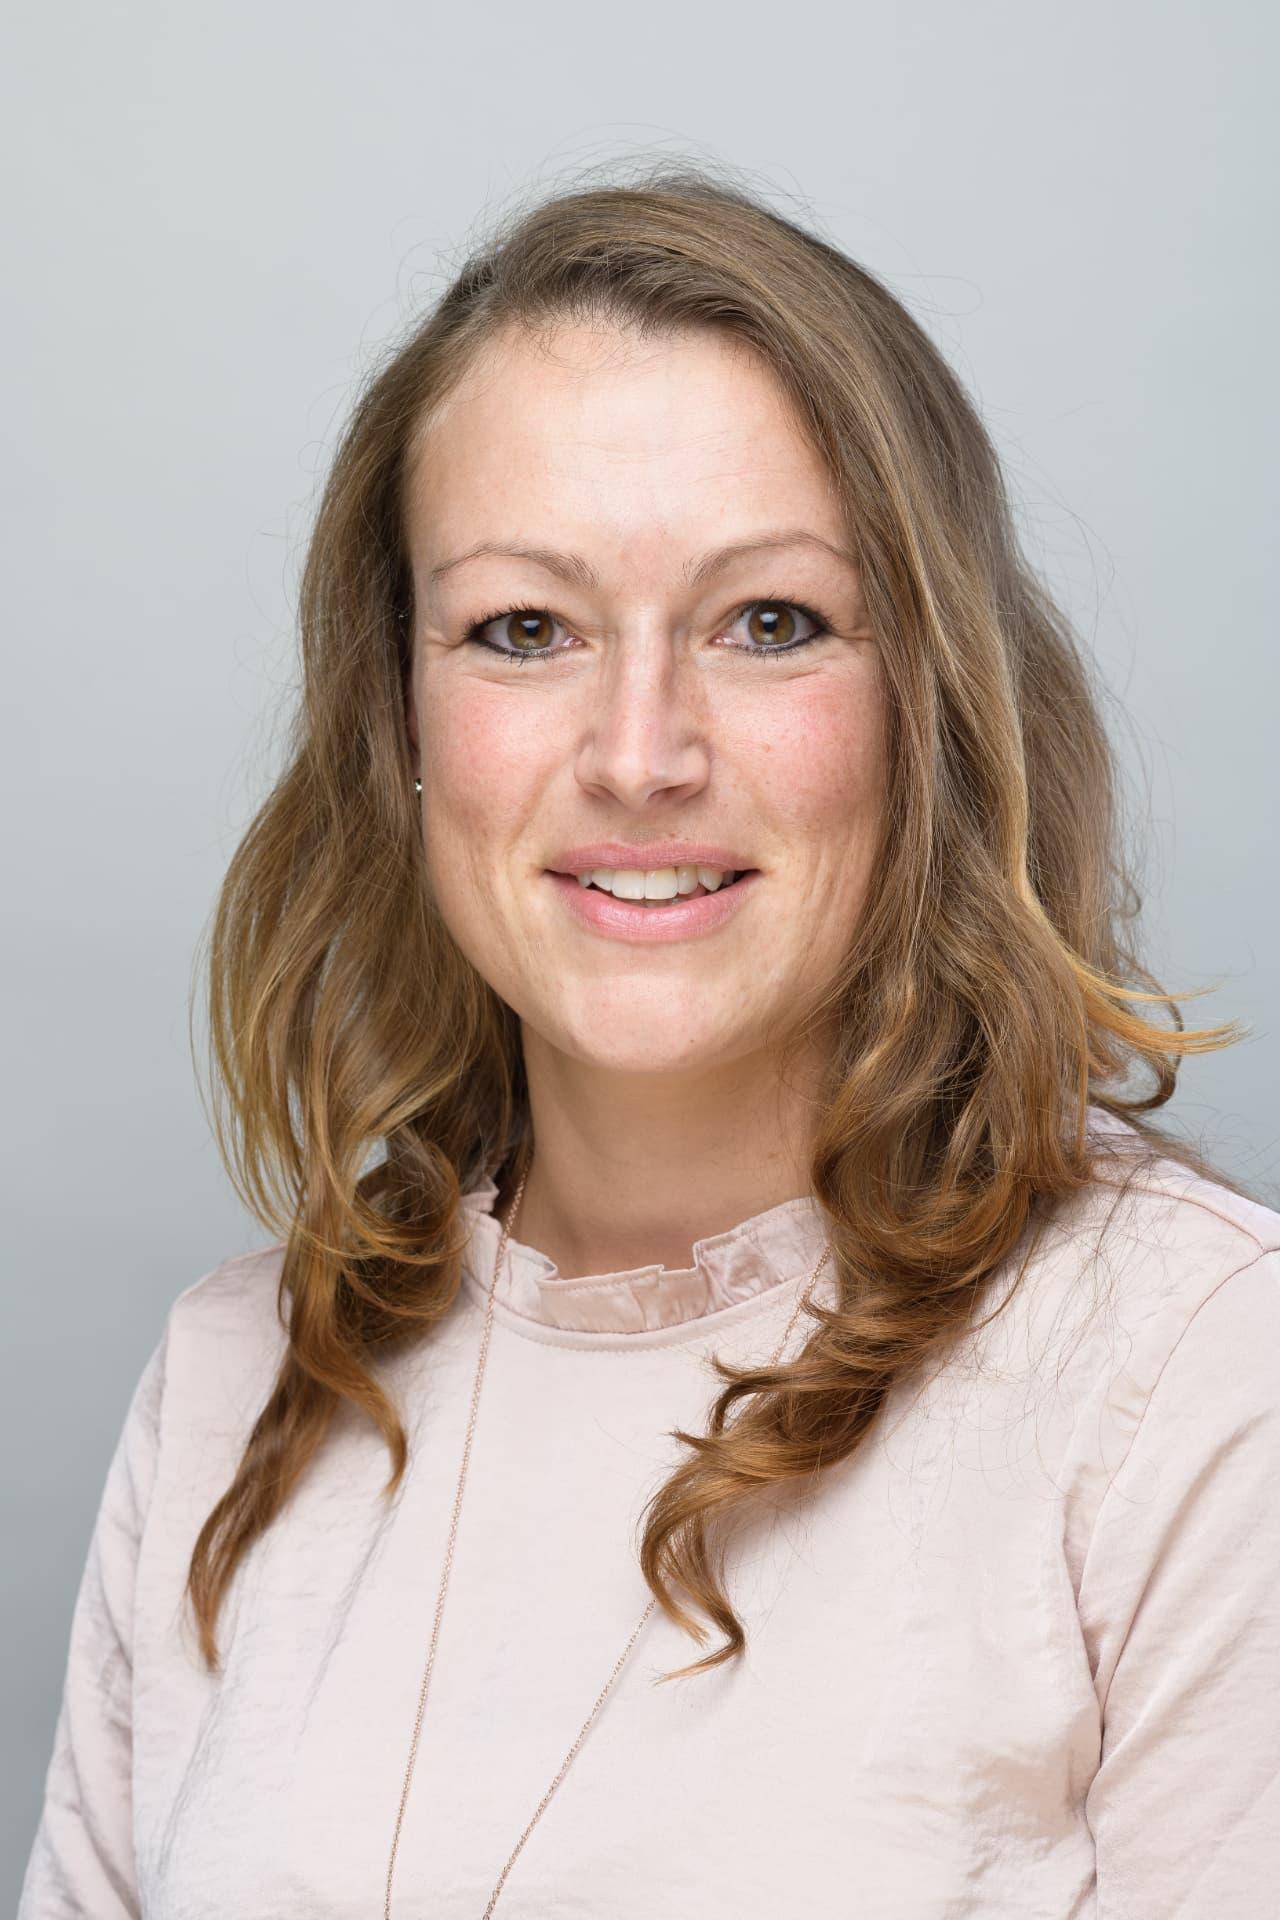 Daniela Zorn